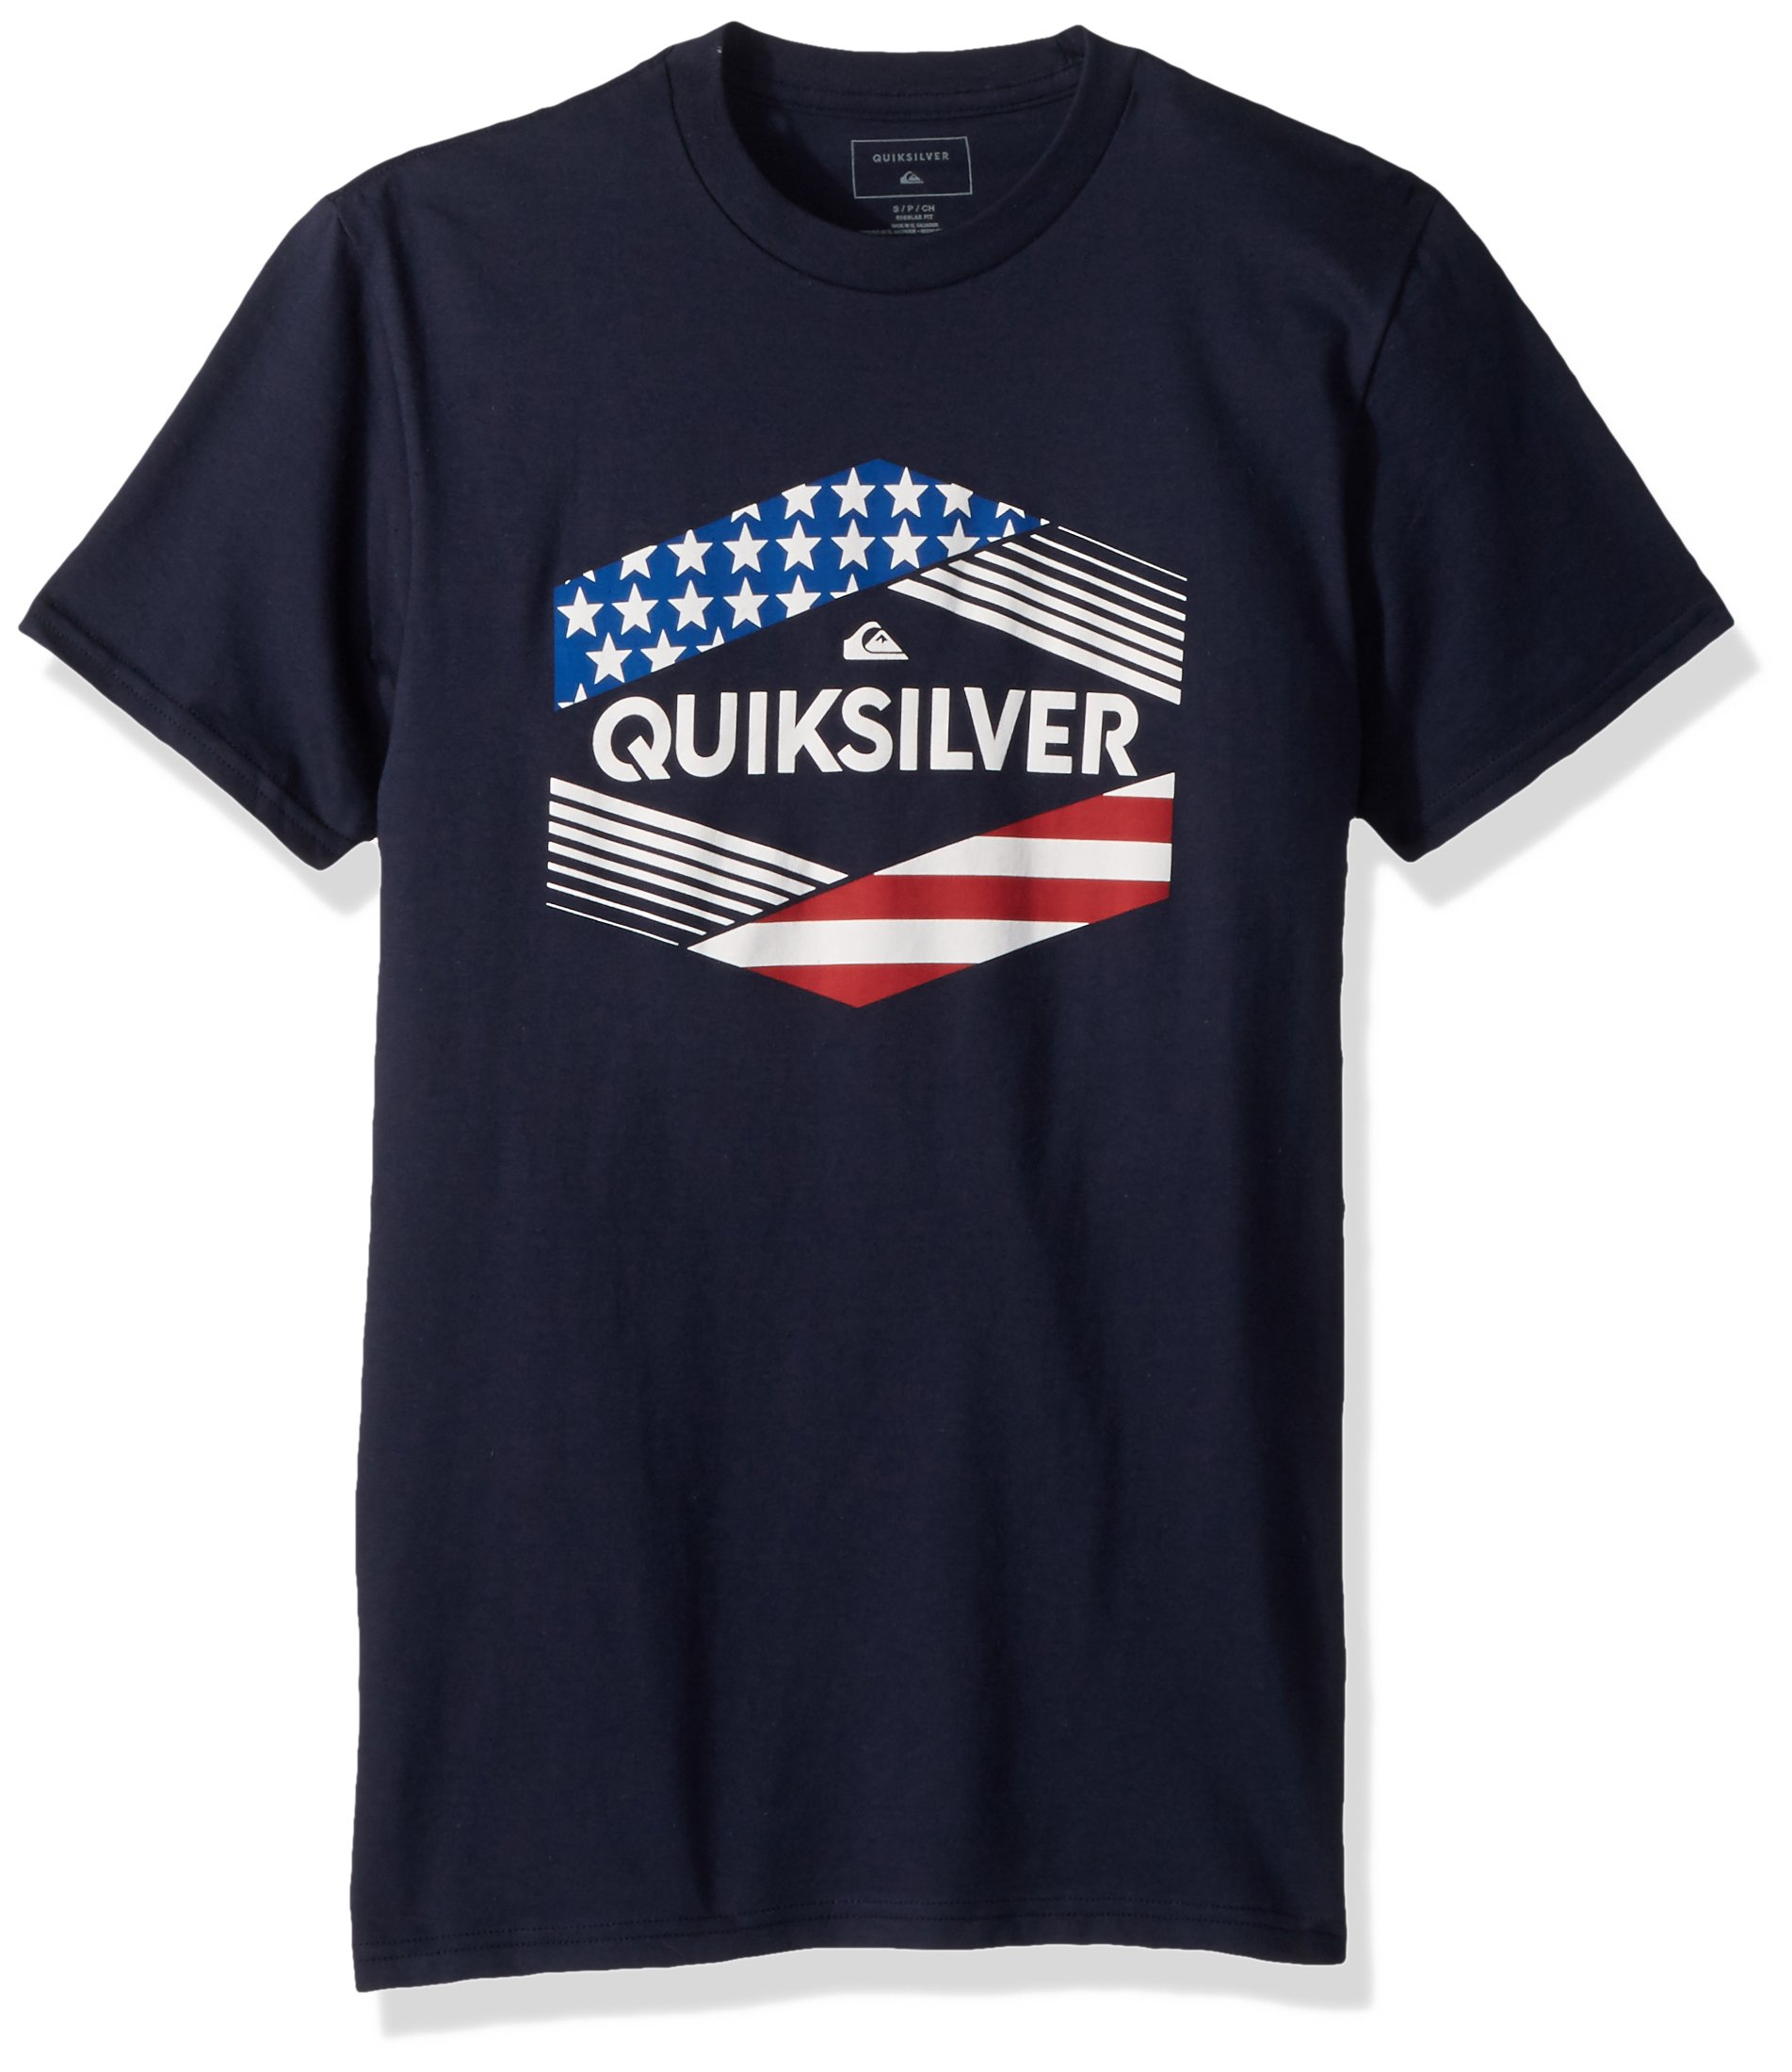 Quiksilver Men's Stars and Stripes Tee, Navy Blazer, L